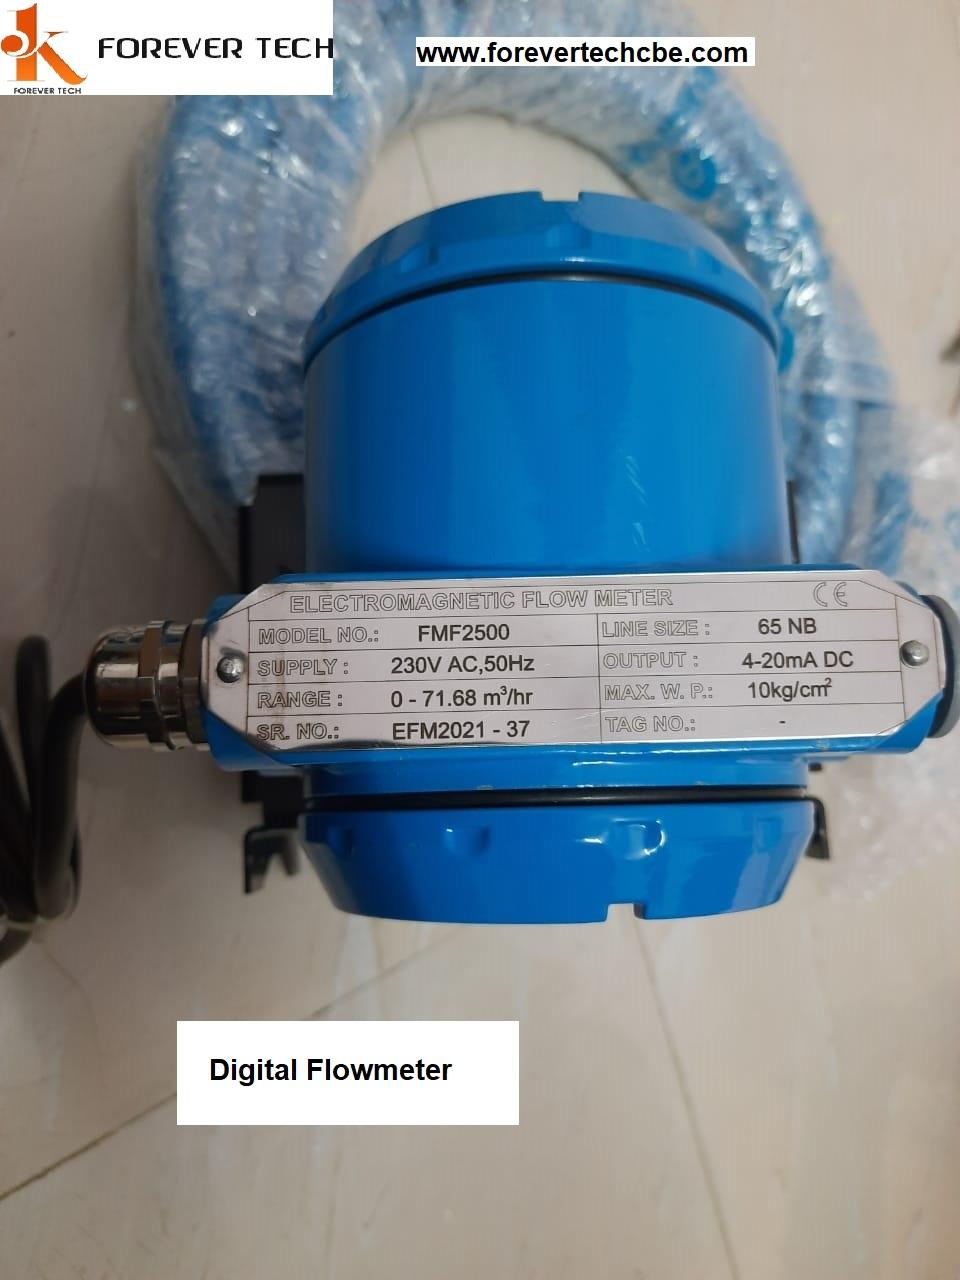 Online Flowmeter